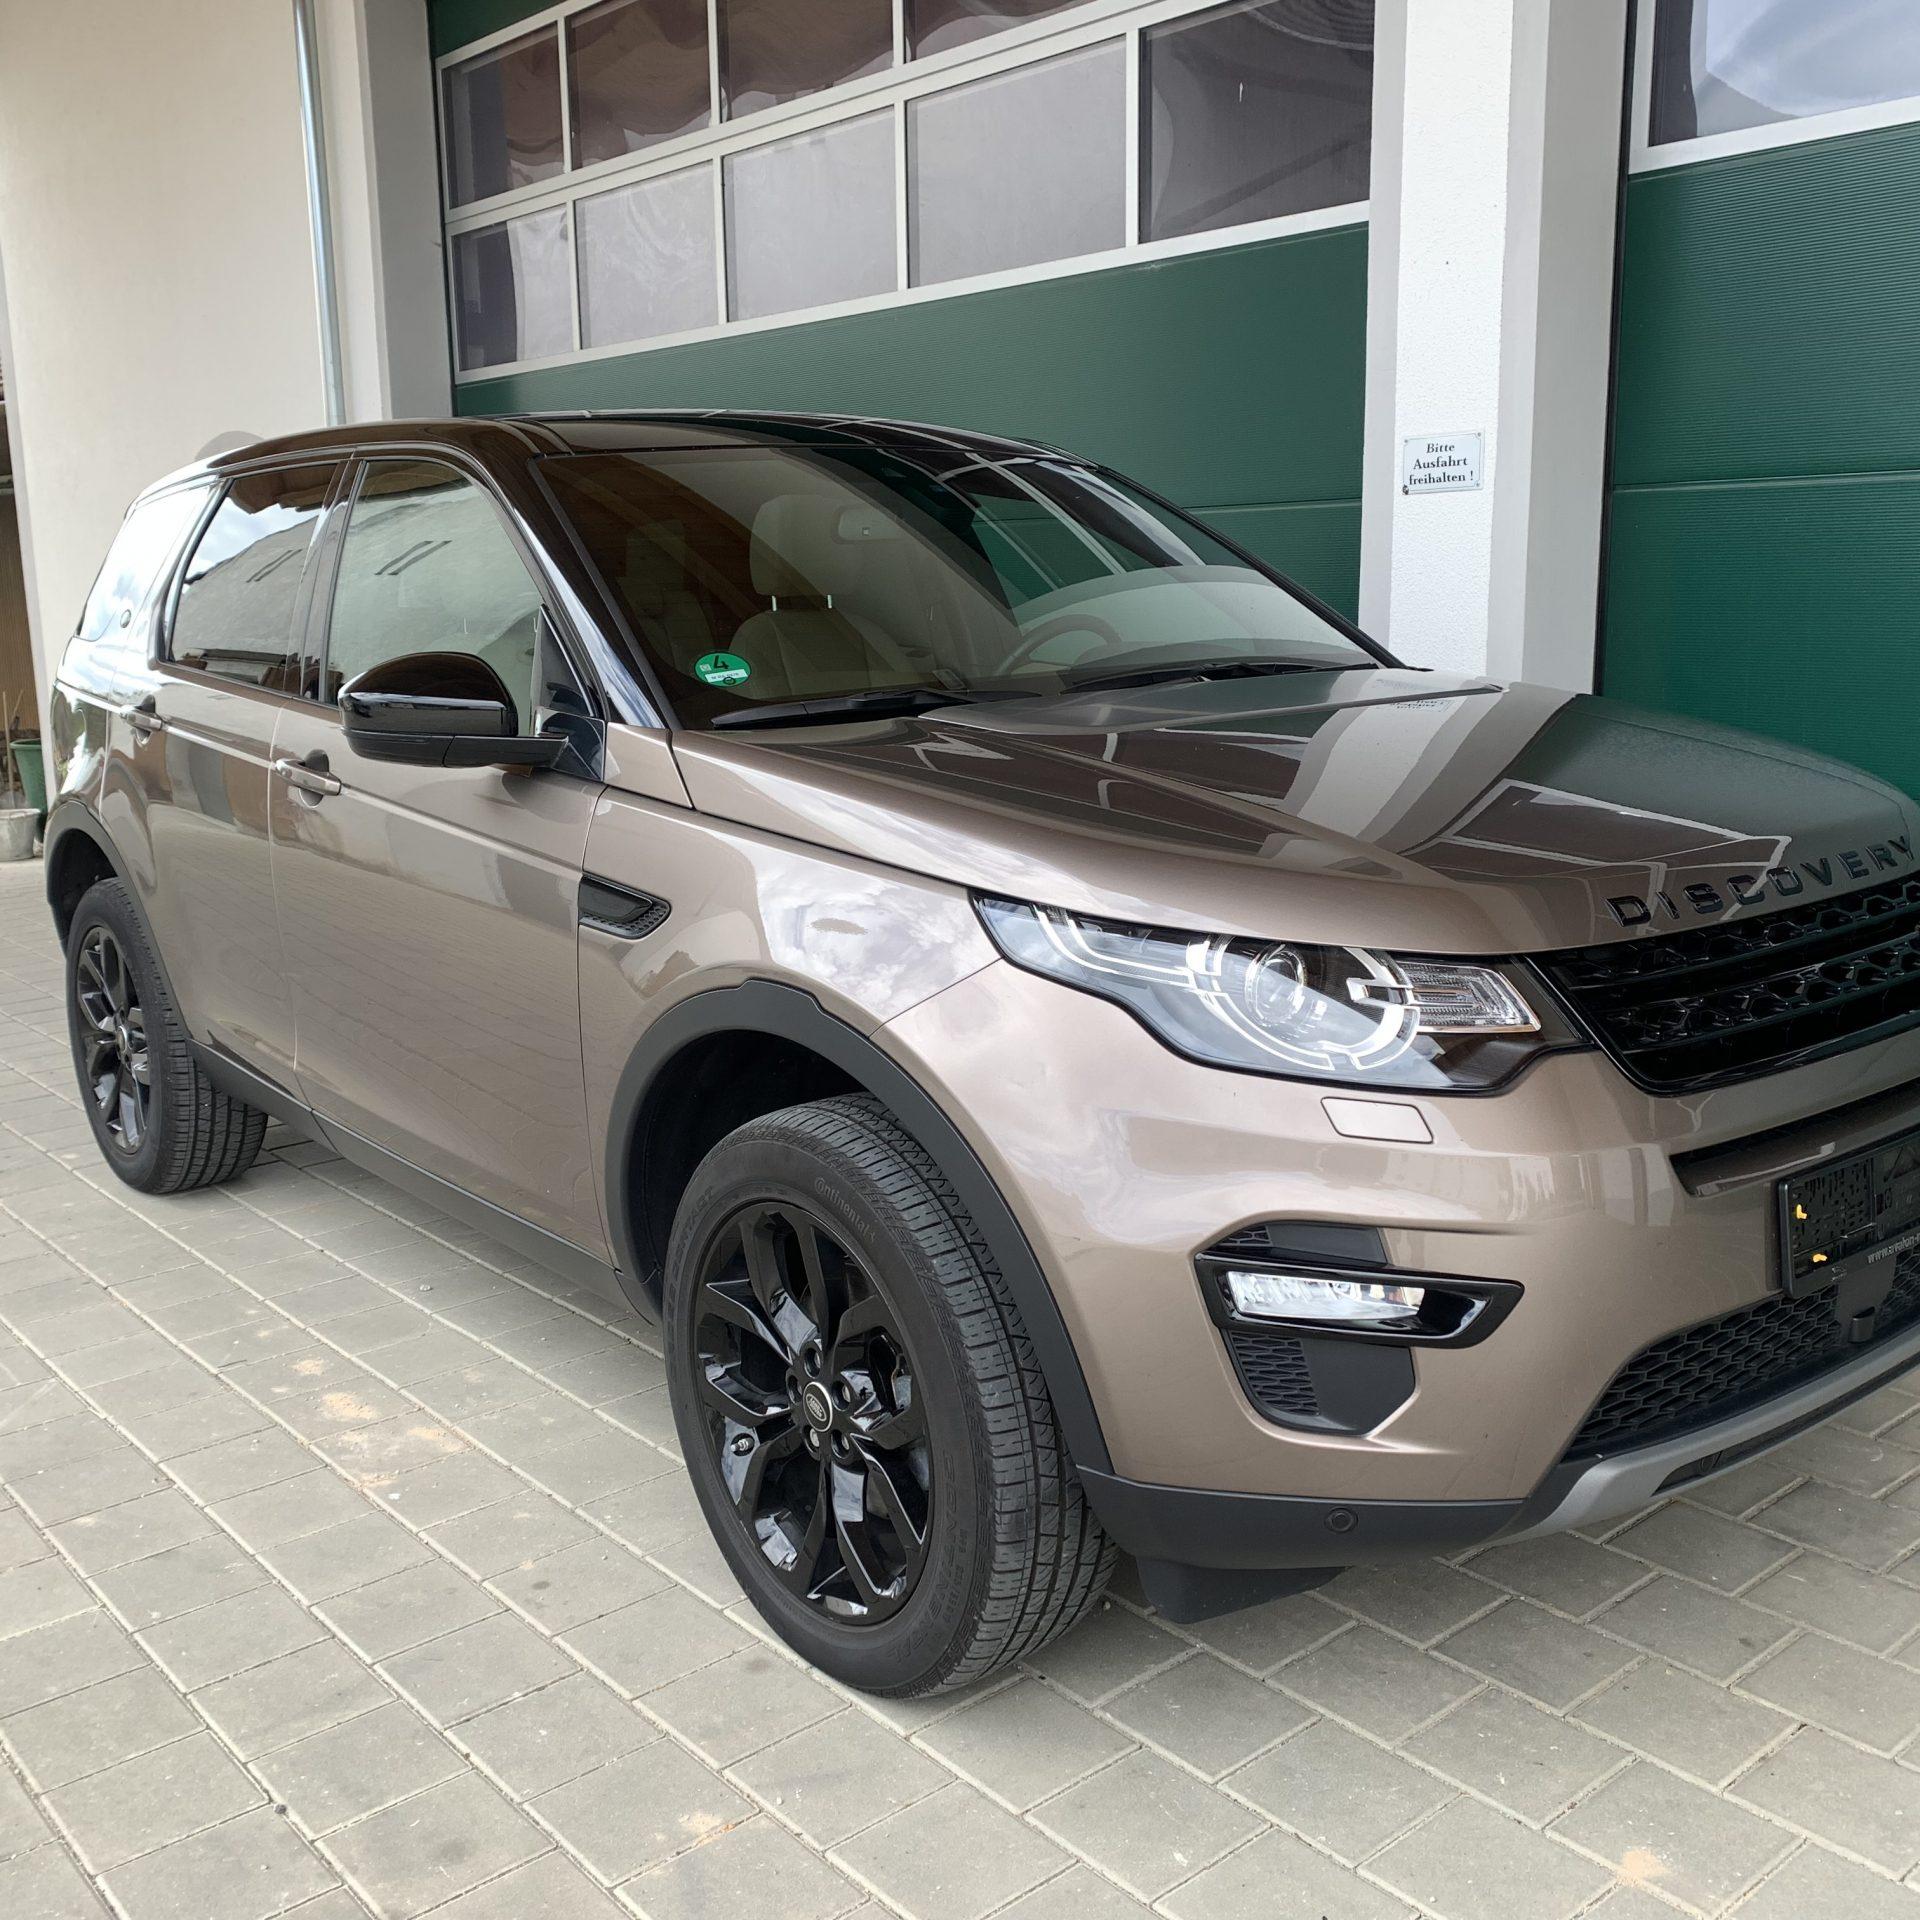 2017 Land Rover Discovery Sport 2.0 Bavariasportscars